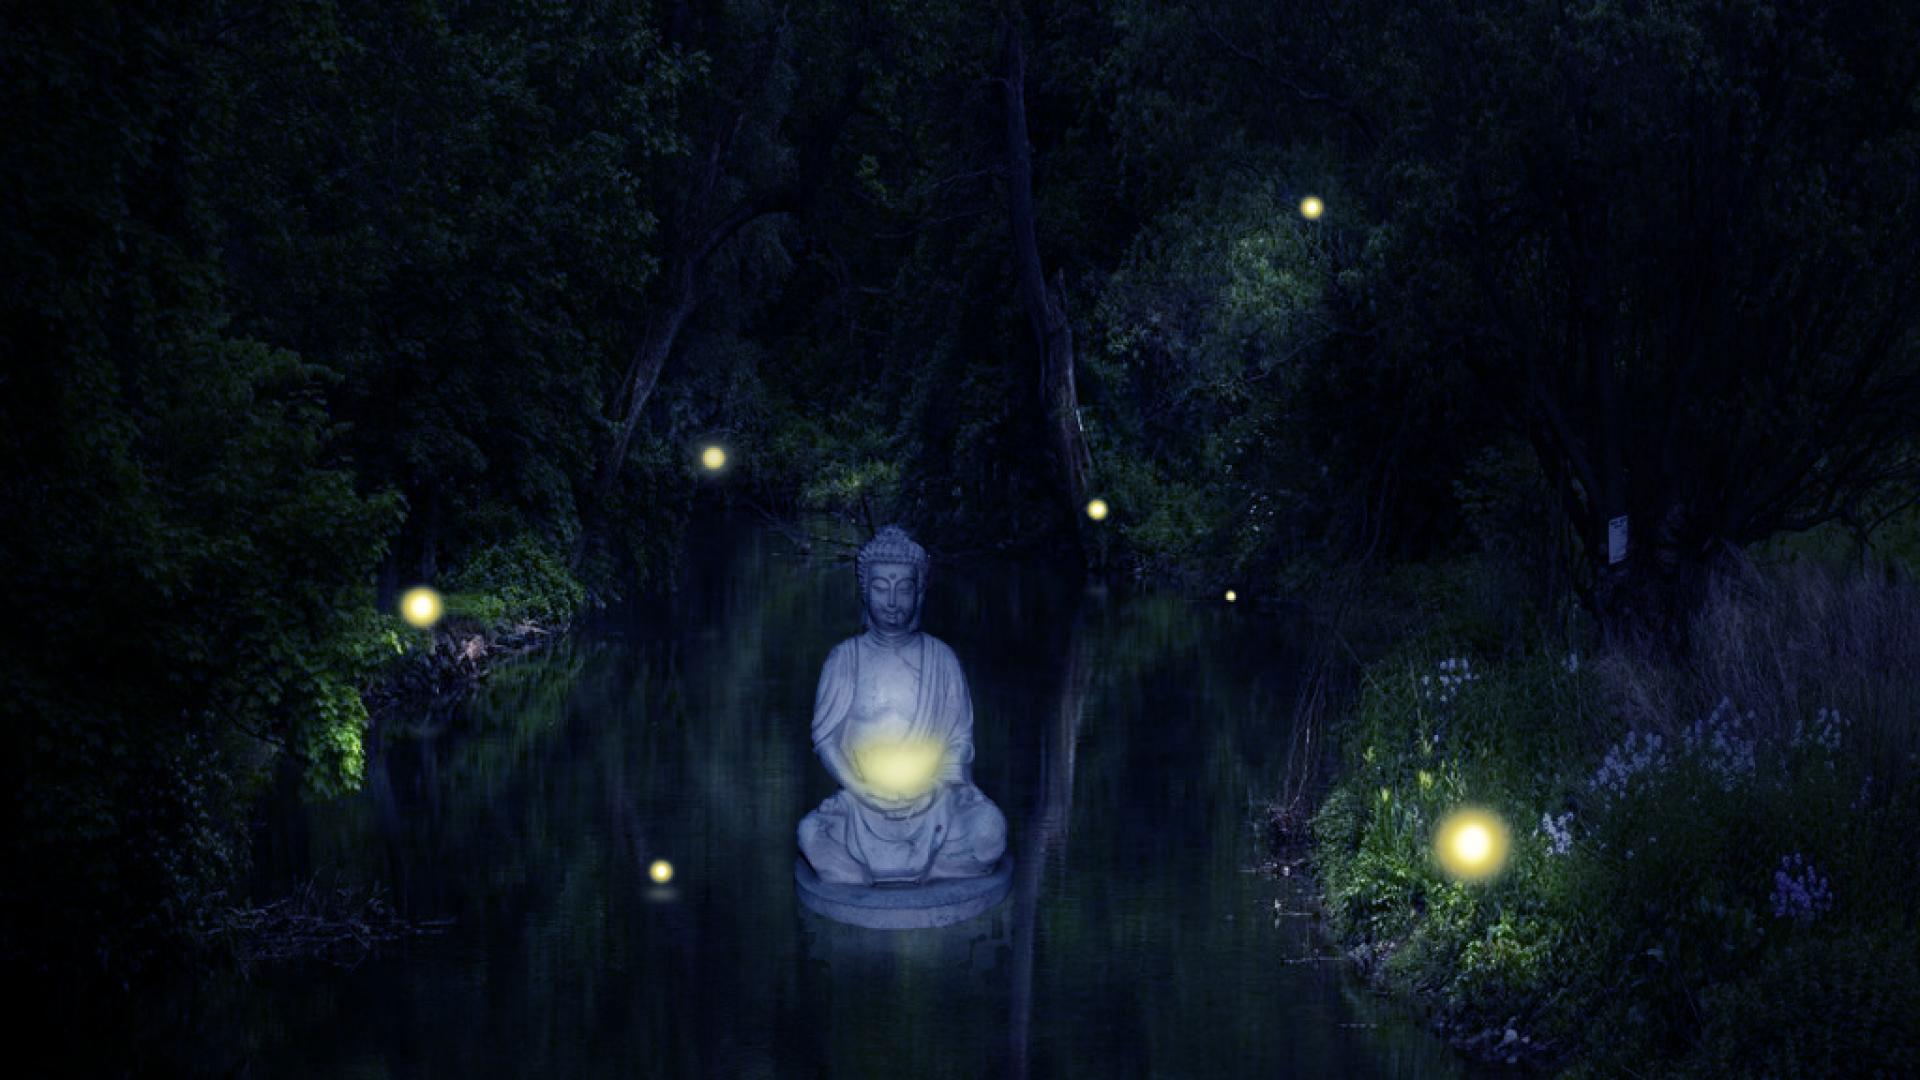 Meditating Wallpaper Posted By John Simpson